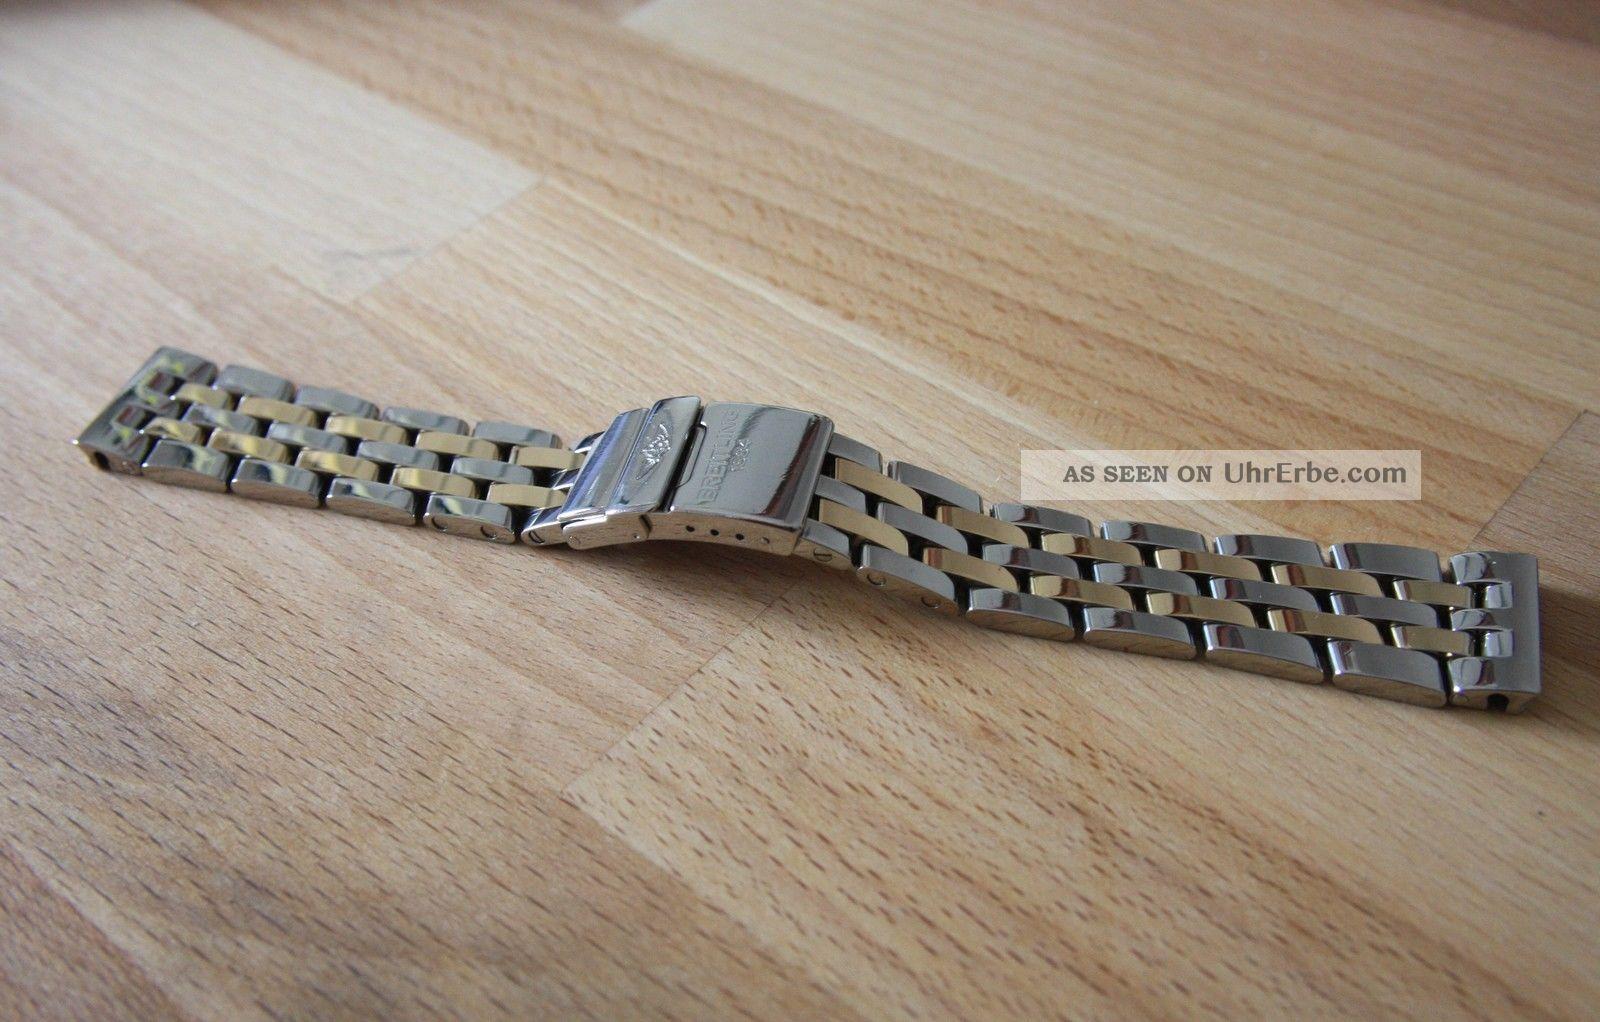 Breitling Sirius Pilotband In Edelstahl / 18k Gelbgold Armbanduhren Bild